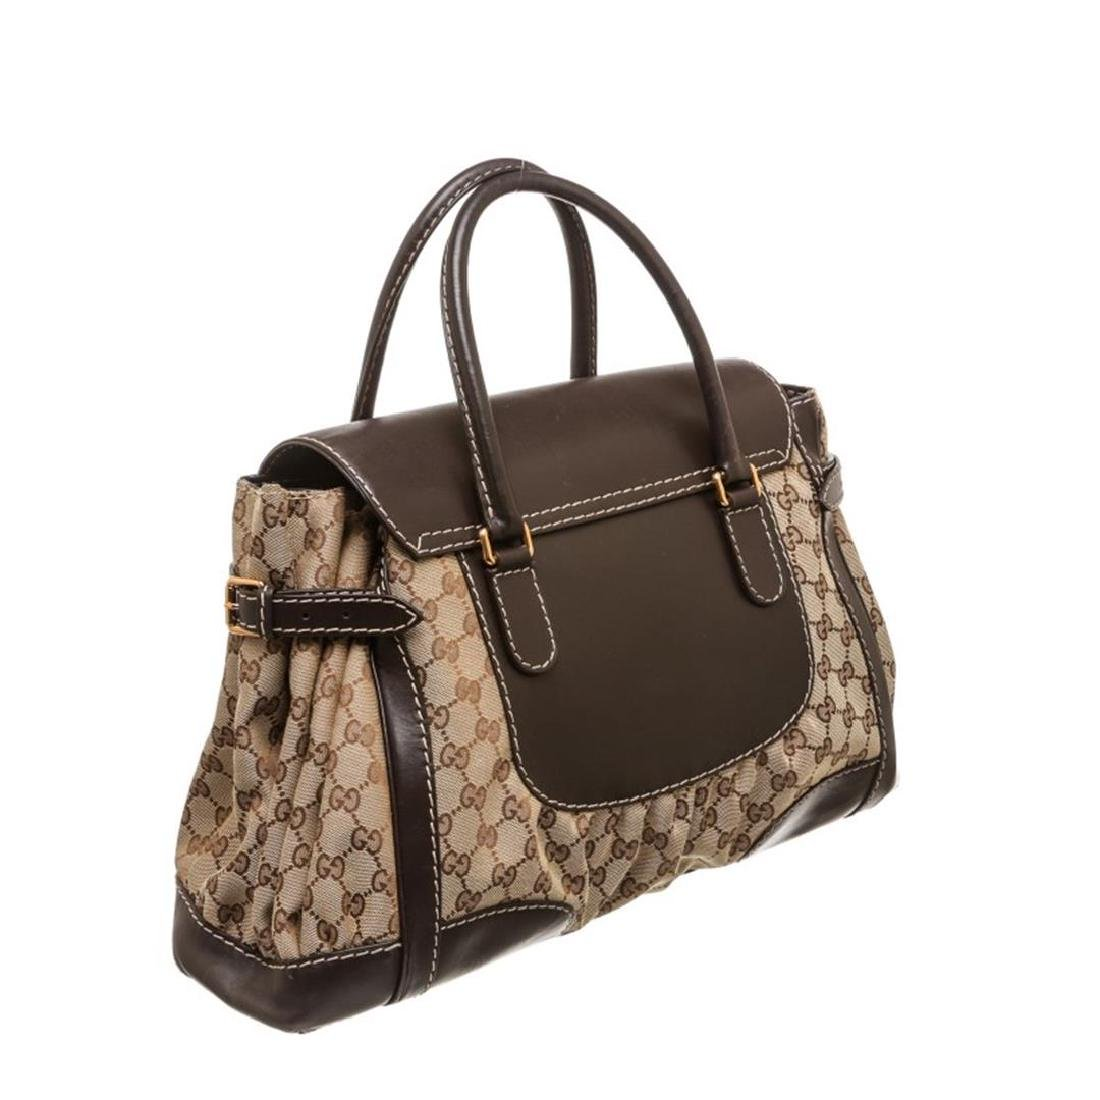 Gucci Beige Canvas Monogram Brown Leather Dialux Queen - 3